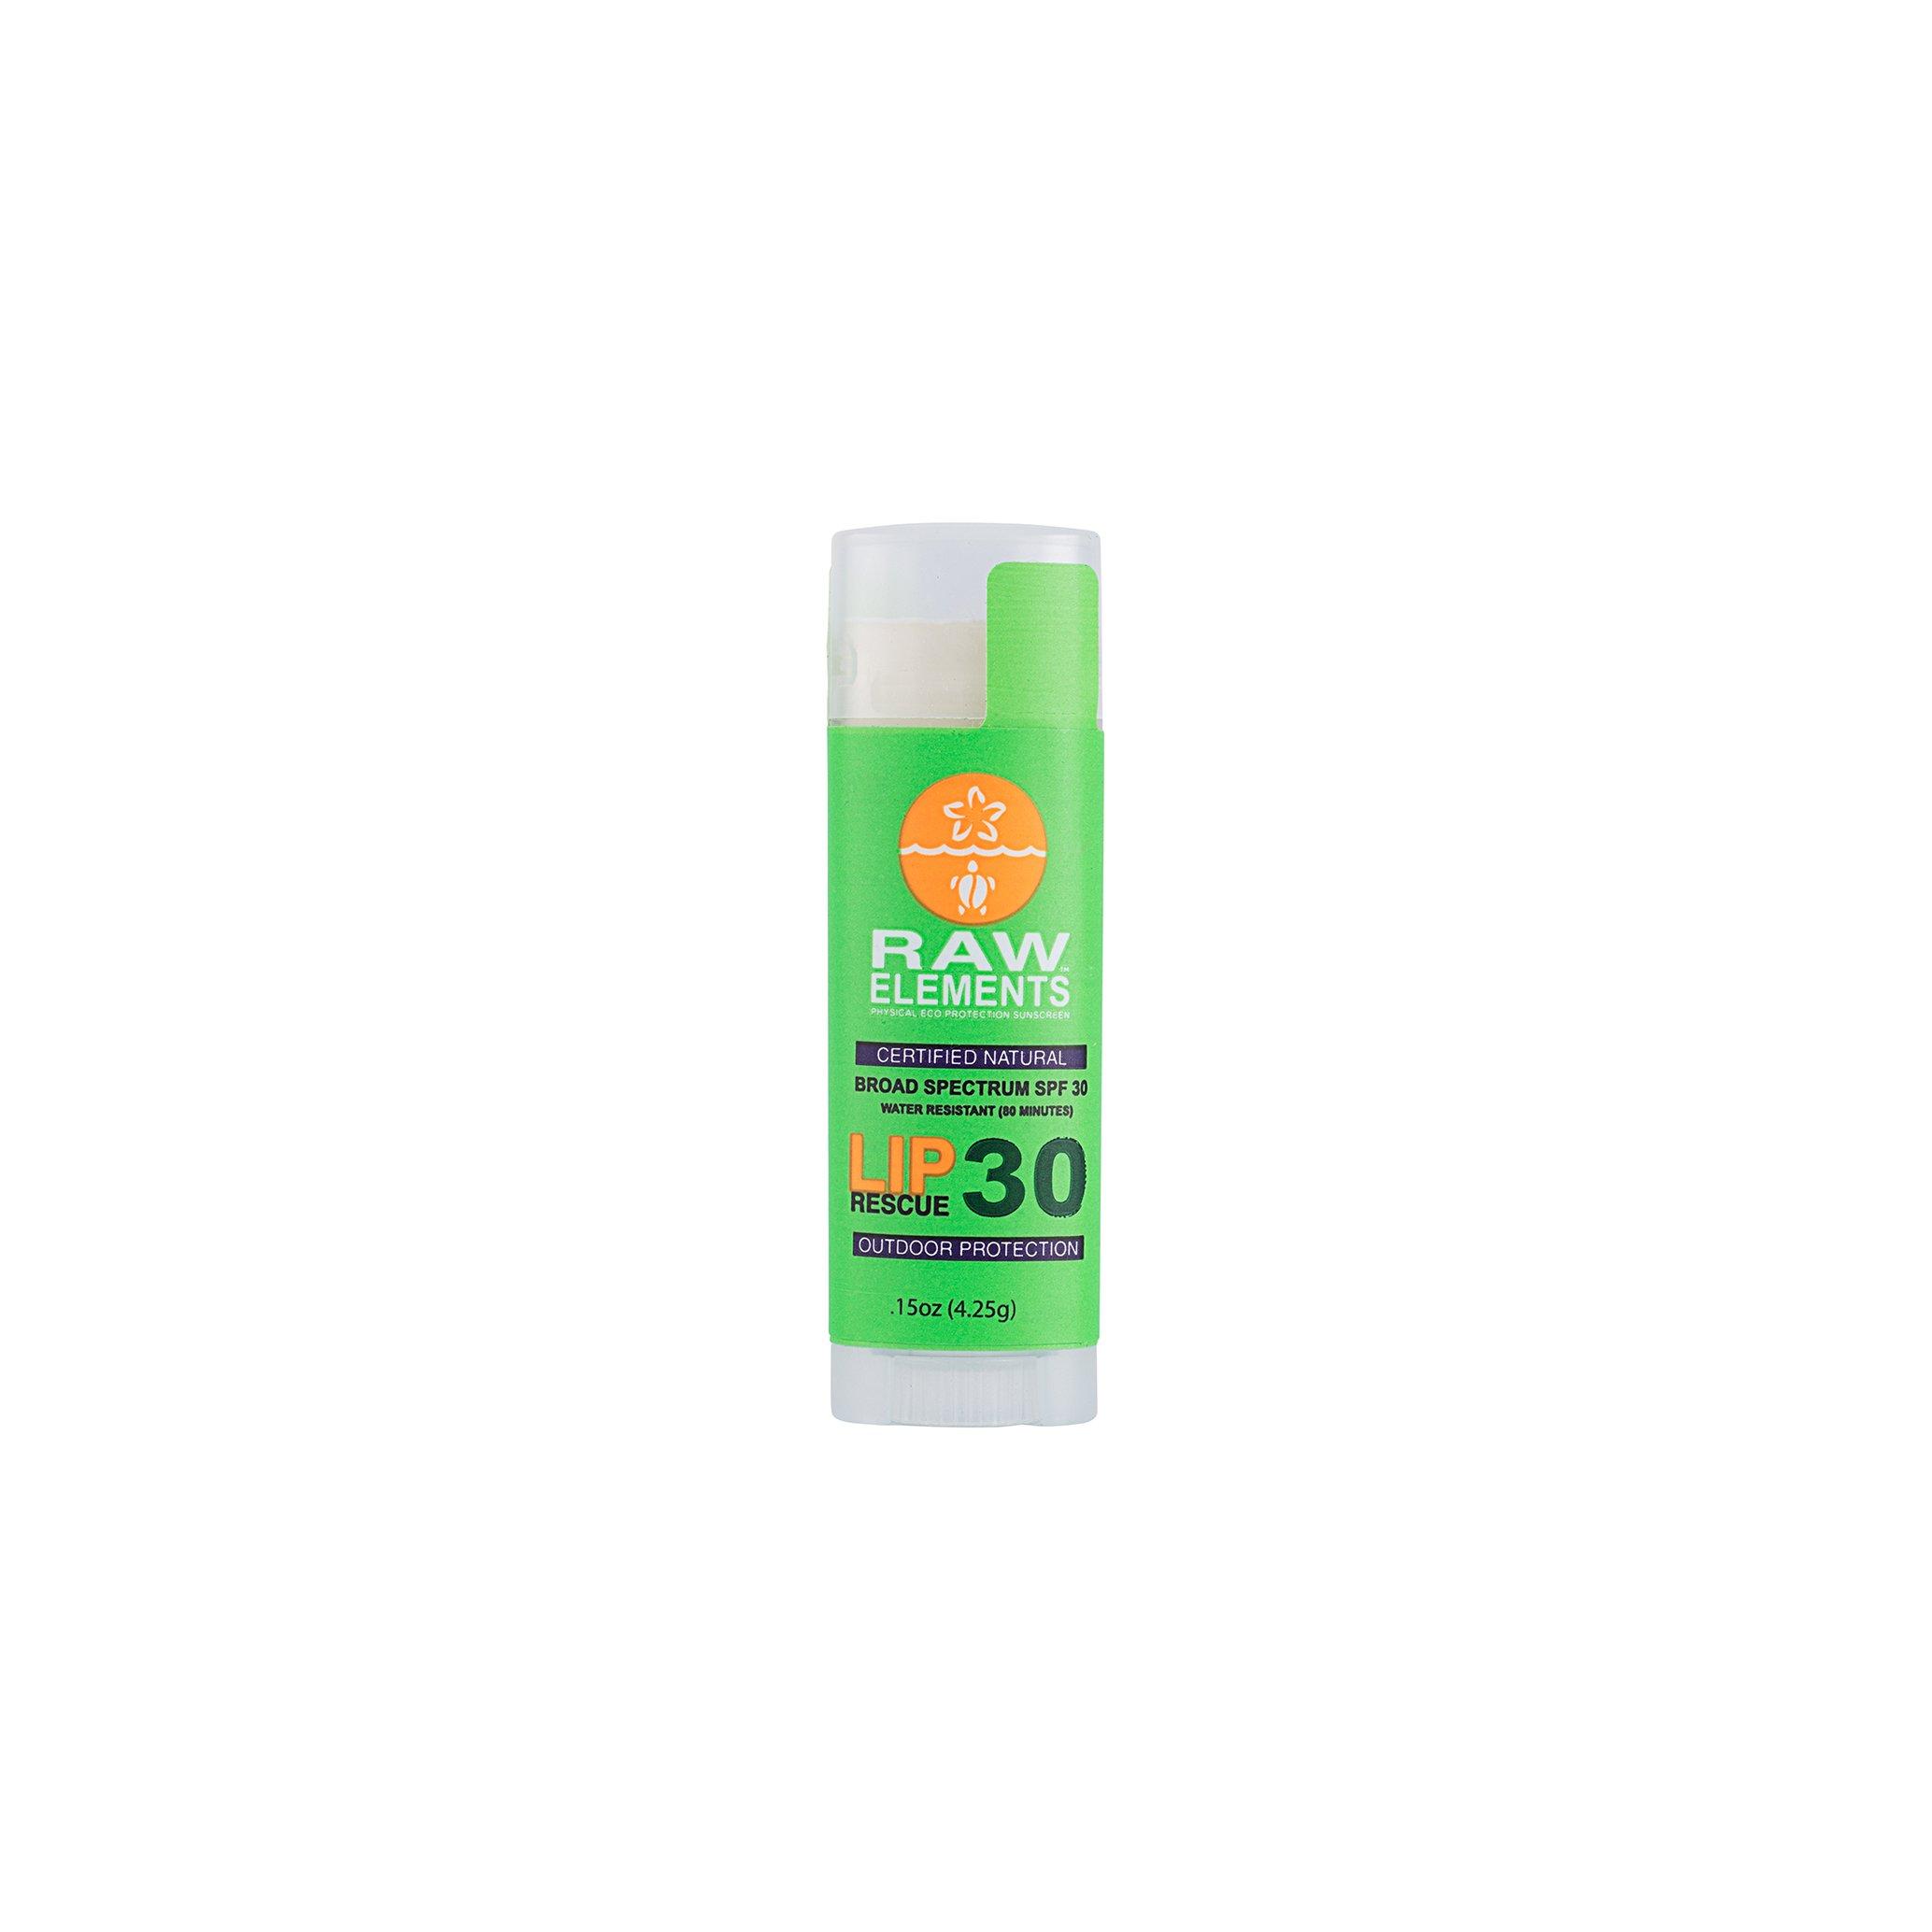 Raw Elements Lip SPF 30+